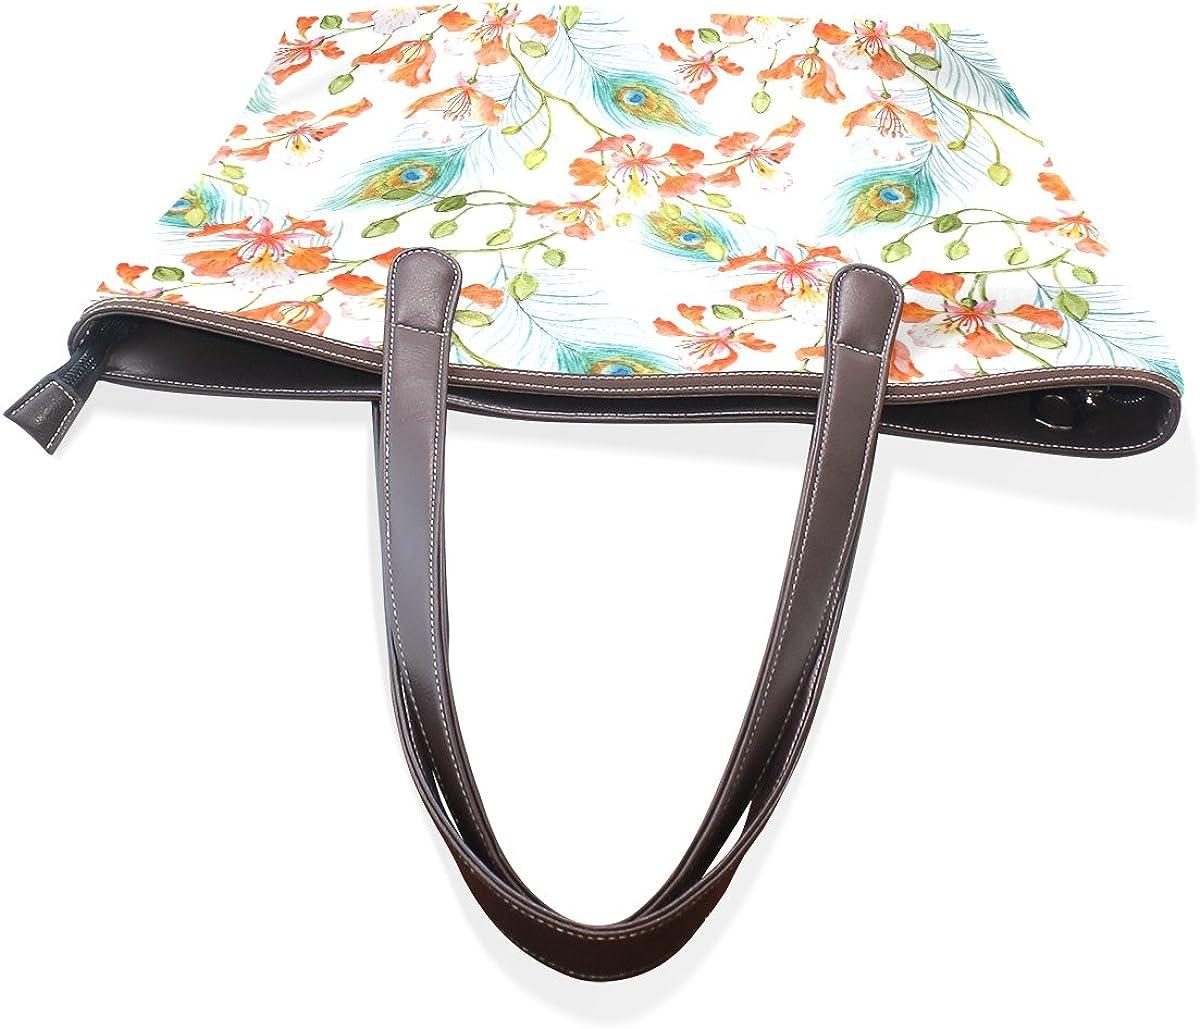 Womens Fashion Bags Beautiful Peacock Feathers Handbag Men Womans Totes Bags Pu Leather Top Handle Satchel Carry Handbag